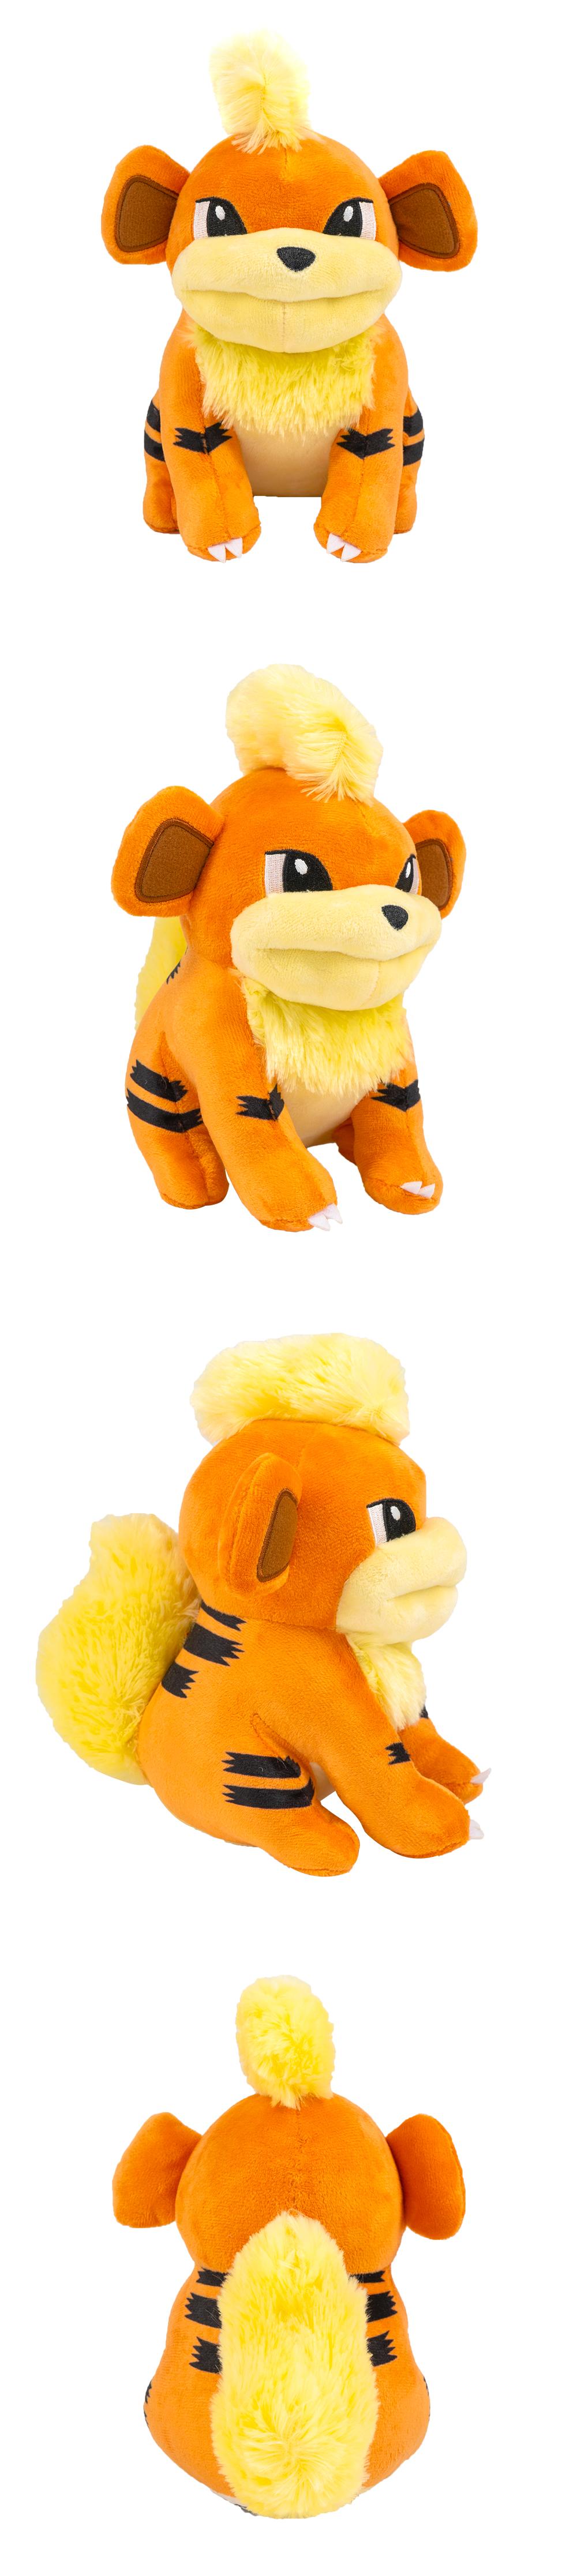 Pokemon精靈寶可夢 卡蒂狗20公分【PM4201010201】